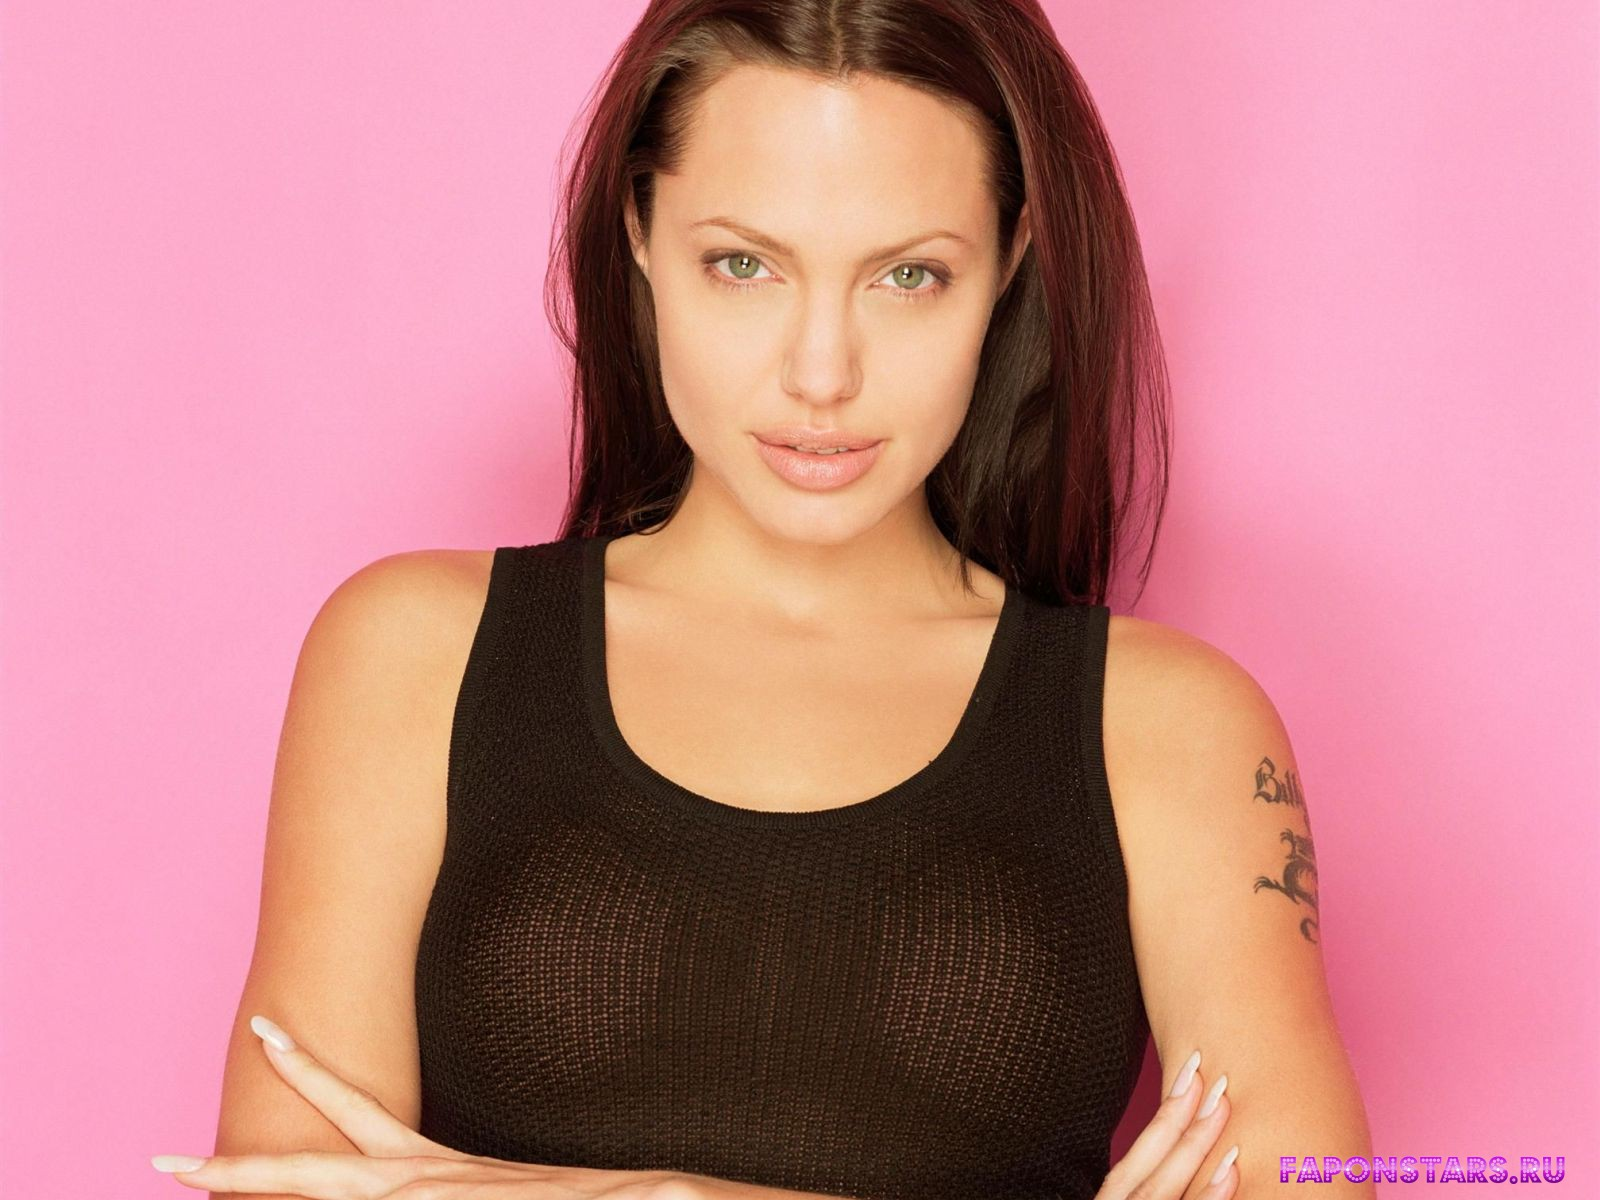 Angelina Jolie / Анджелина Джоли голая фото